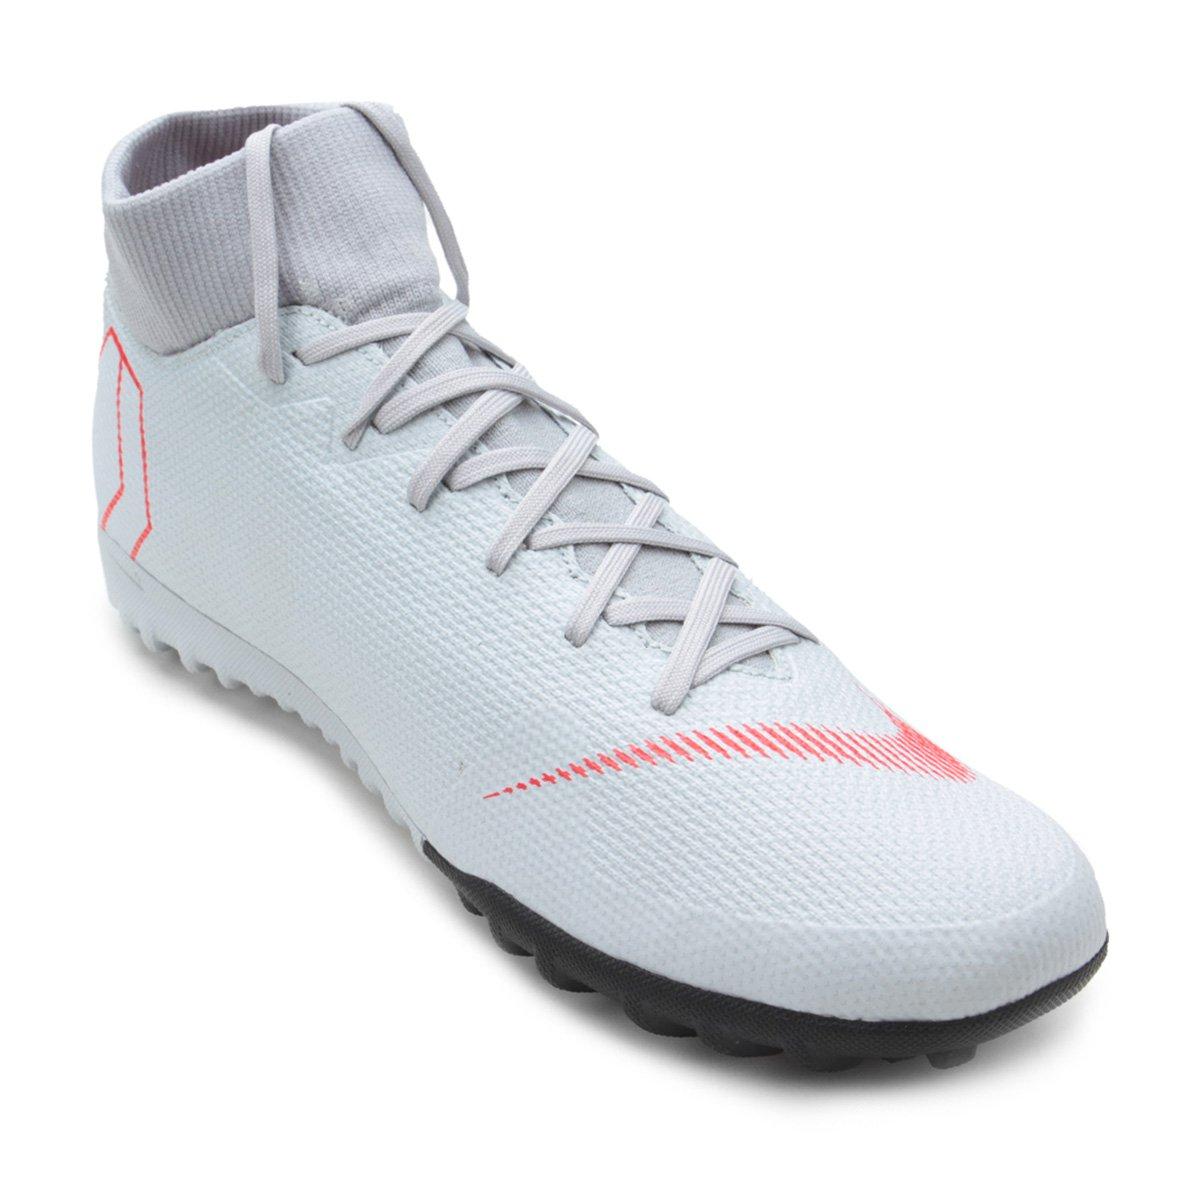 ea9f49bbc6f76 Chuteira Society Nike Mercurial Superfly 6 Academy - Cinza | Shop Timão